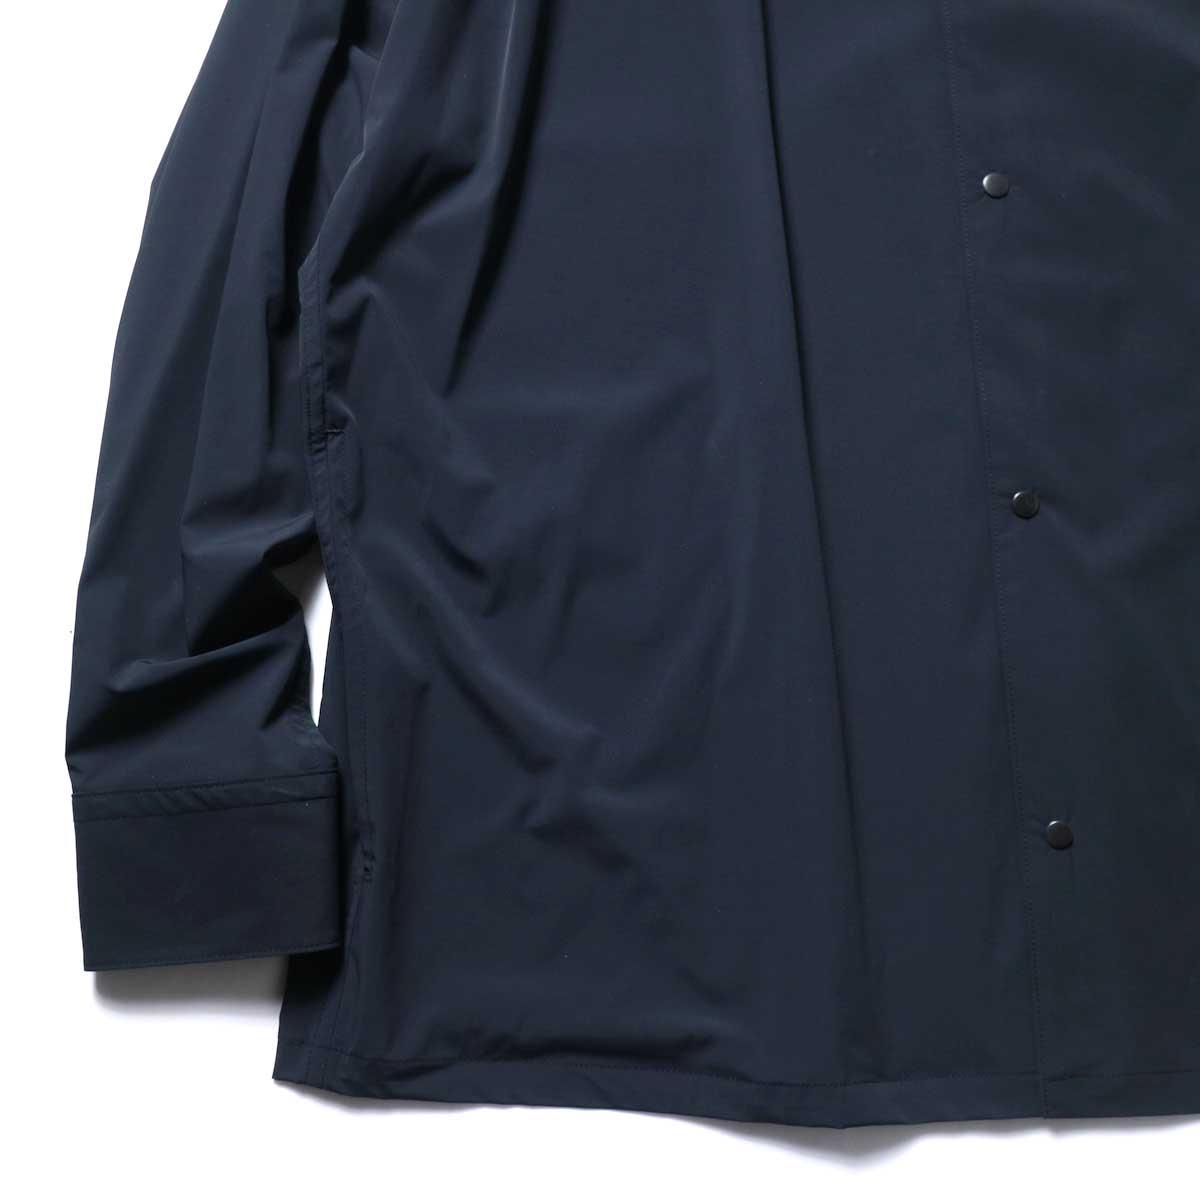 N.HOOLYWOOD / 2211-SH25-006 peg Collarless Shirt (Black)袖、裾